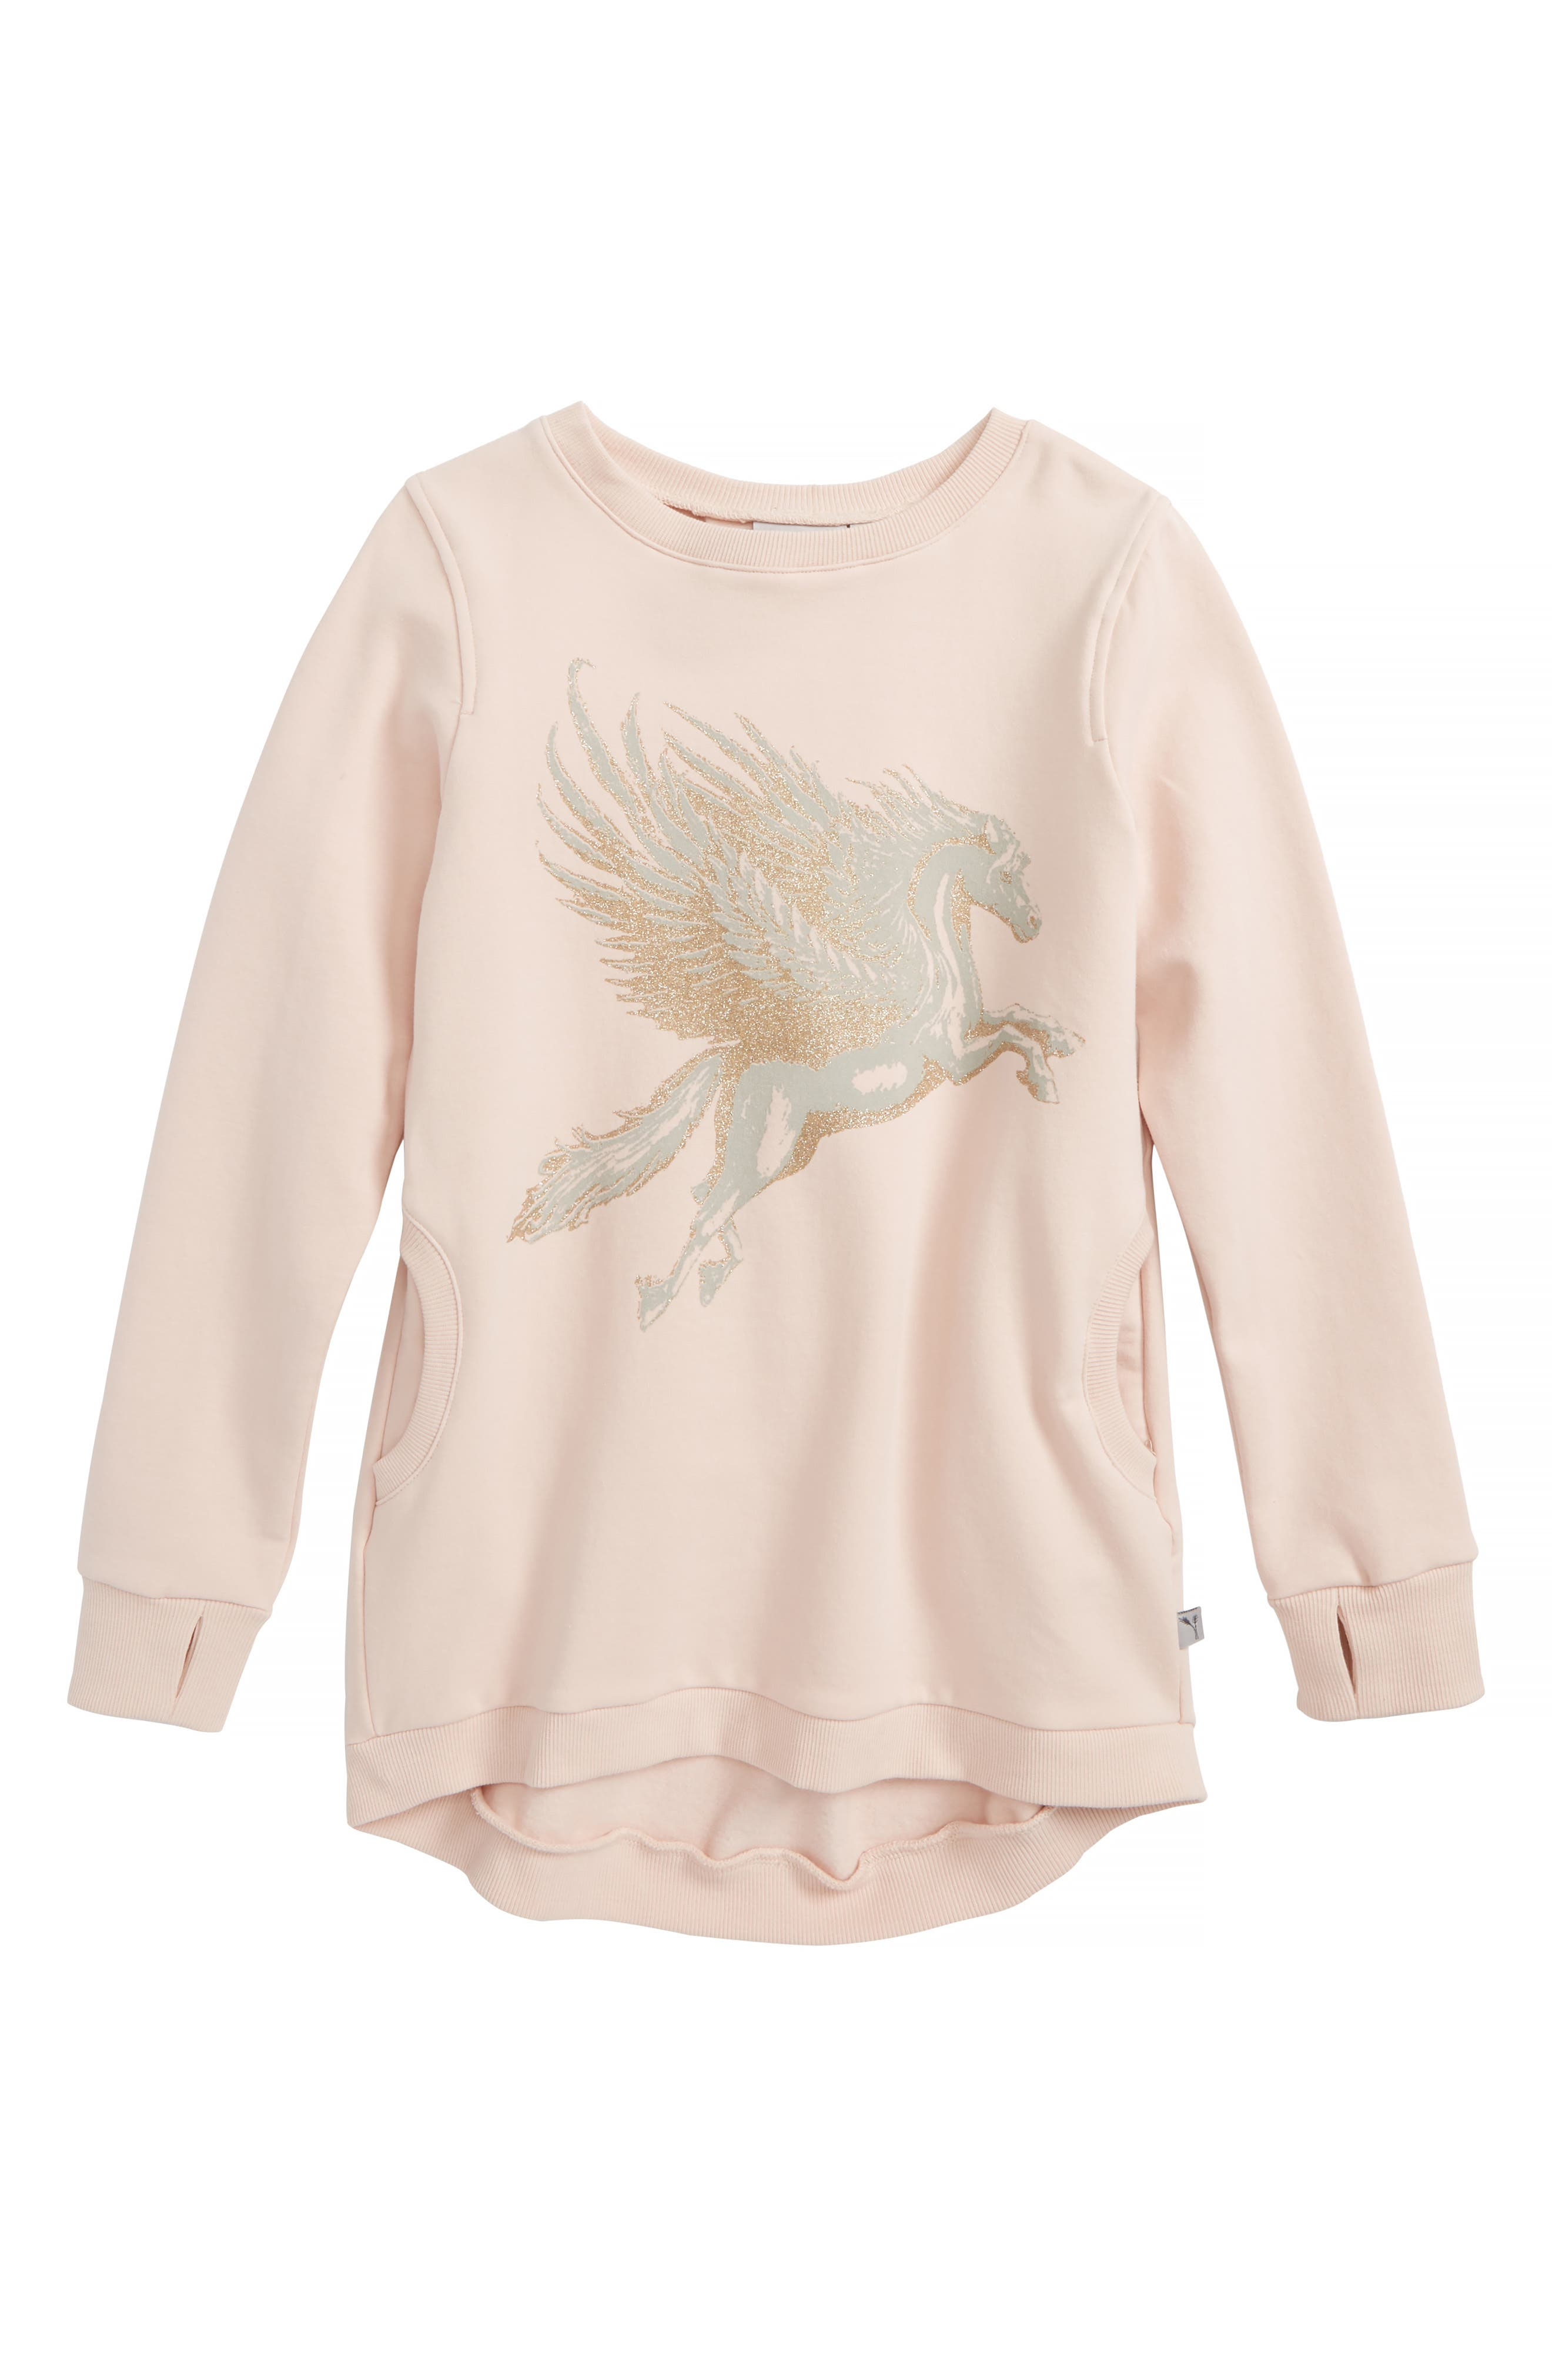 Wheat Glitter Graphic Sweatshirt (Toddler Girls, Little Girls & Big Girls)